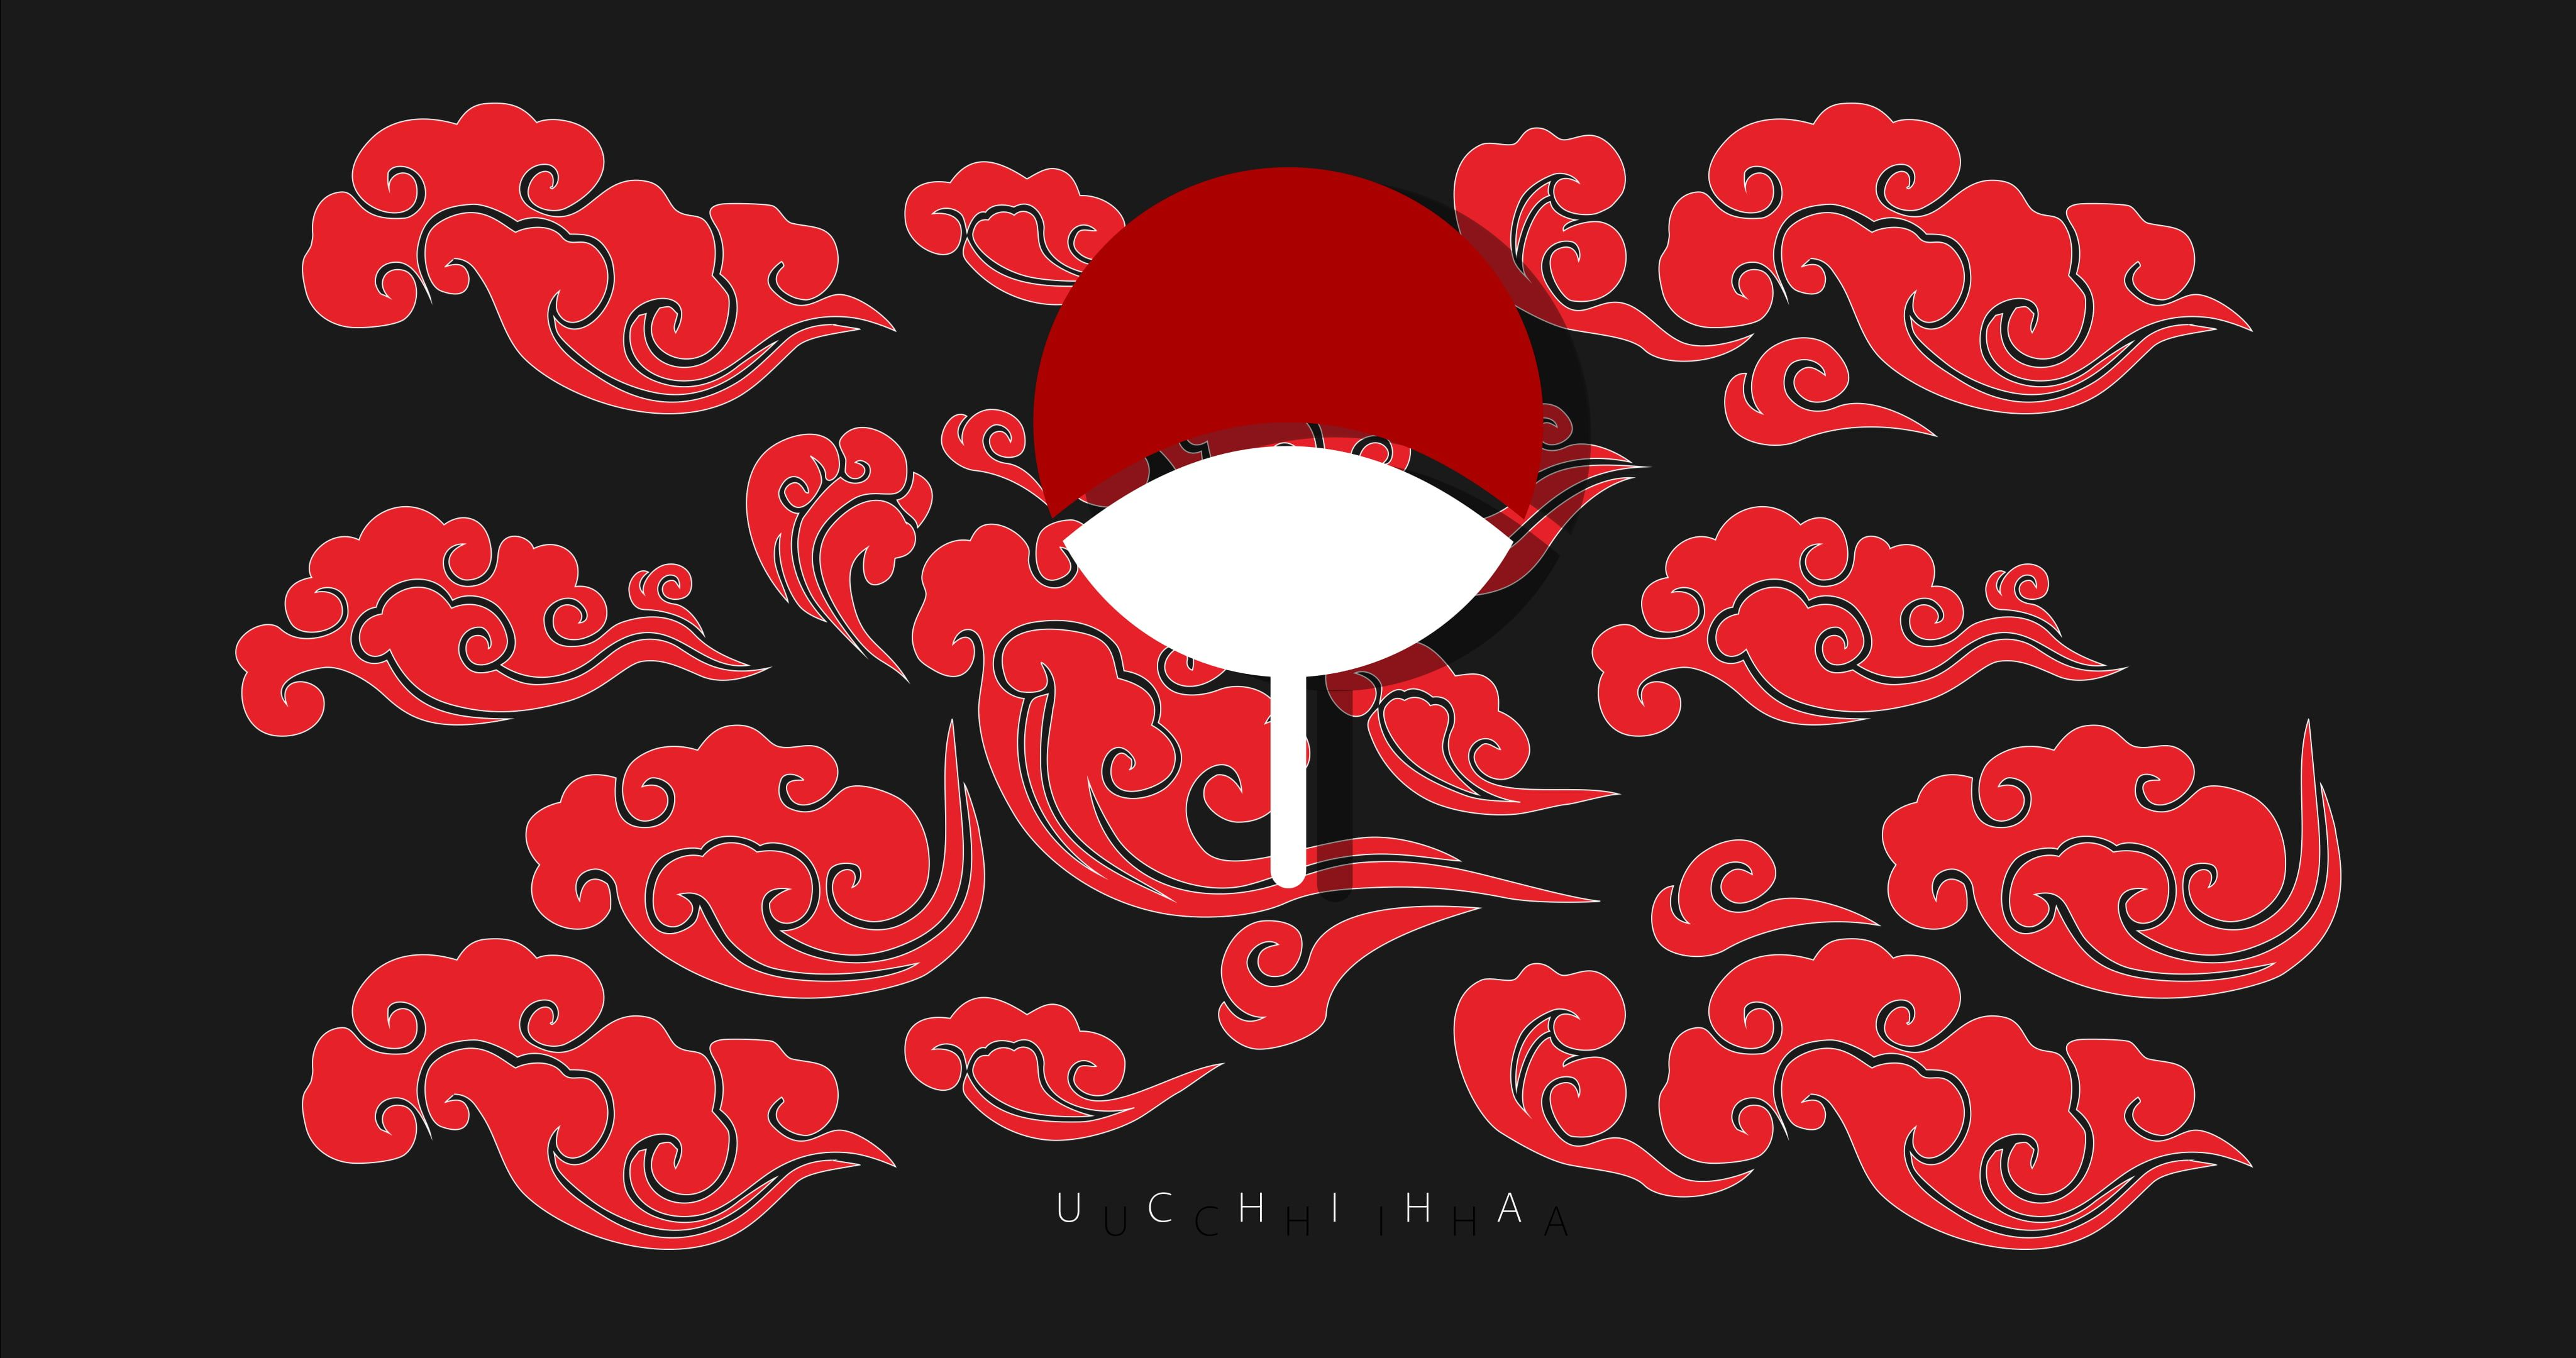 Uchiha Clan Naruto Anime Crest Clouds Anime 4k Wallpaper Hdwallpaper Desktop Cool Anime Wallpapers Anime Backgrounds Wallpapers Anime Wallpaper